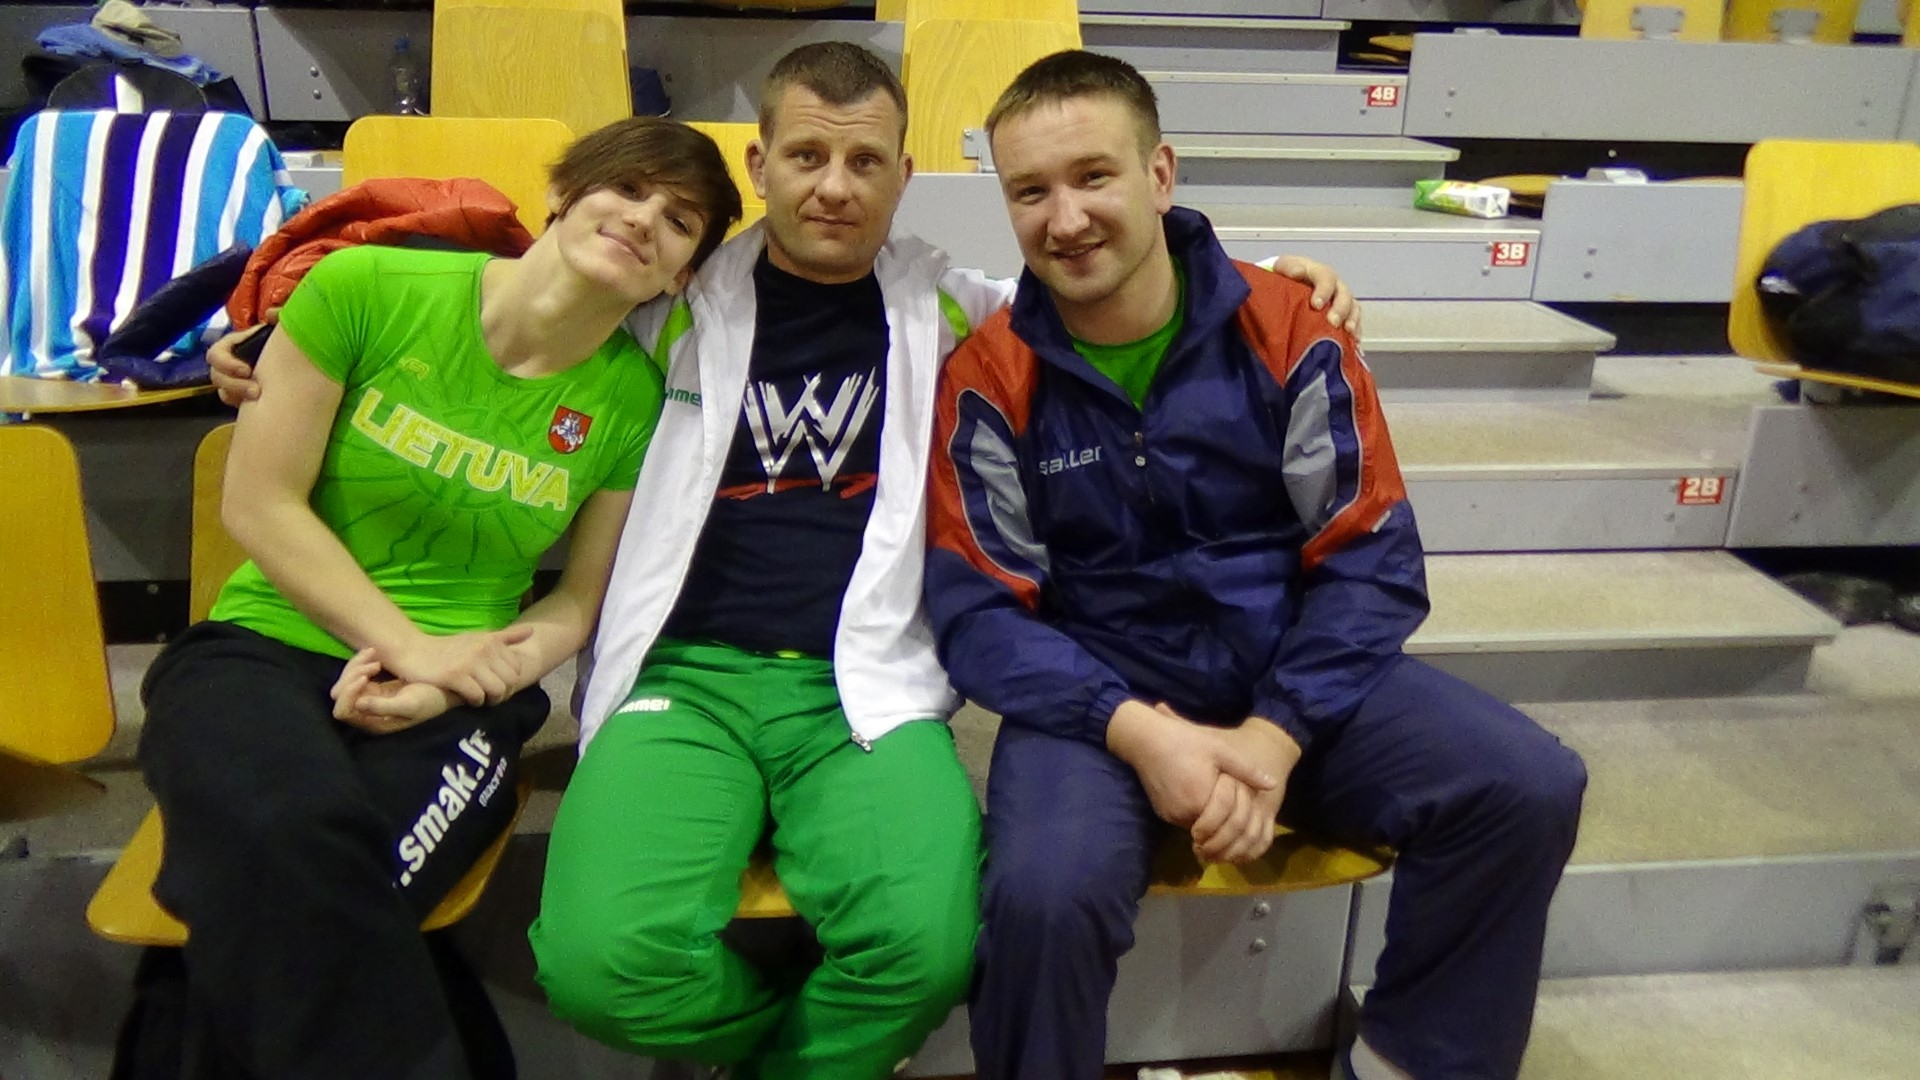 D.Domikaitytė, treneriai A.Kaselis ir O.Antoščenkovas